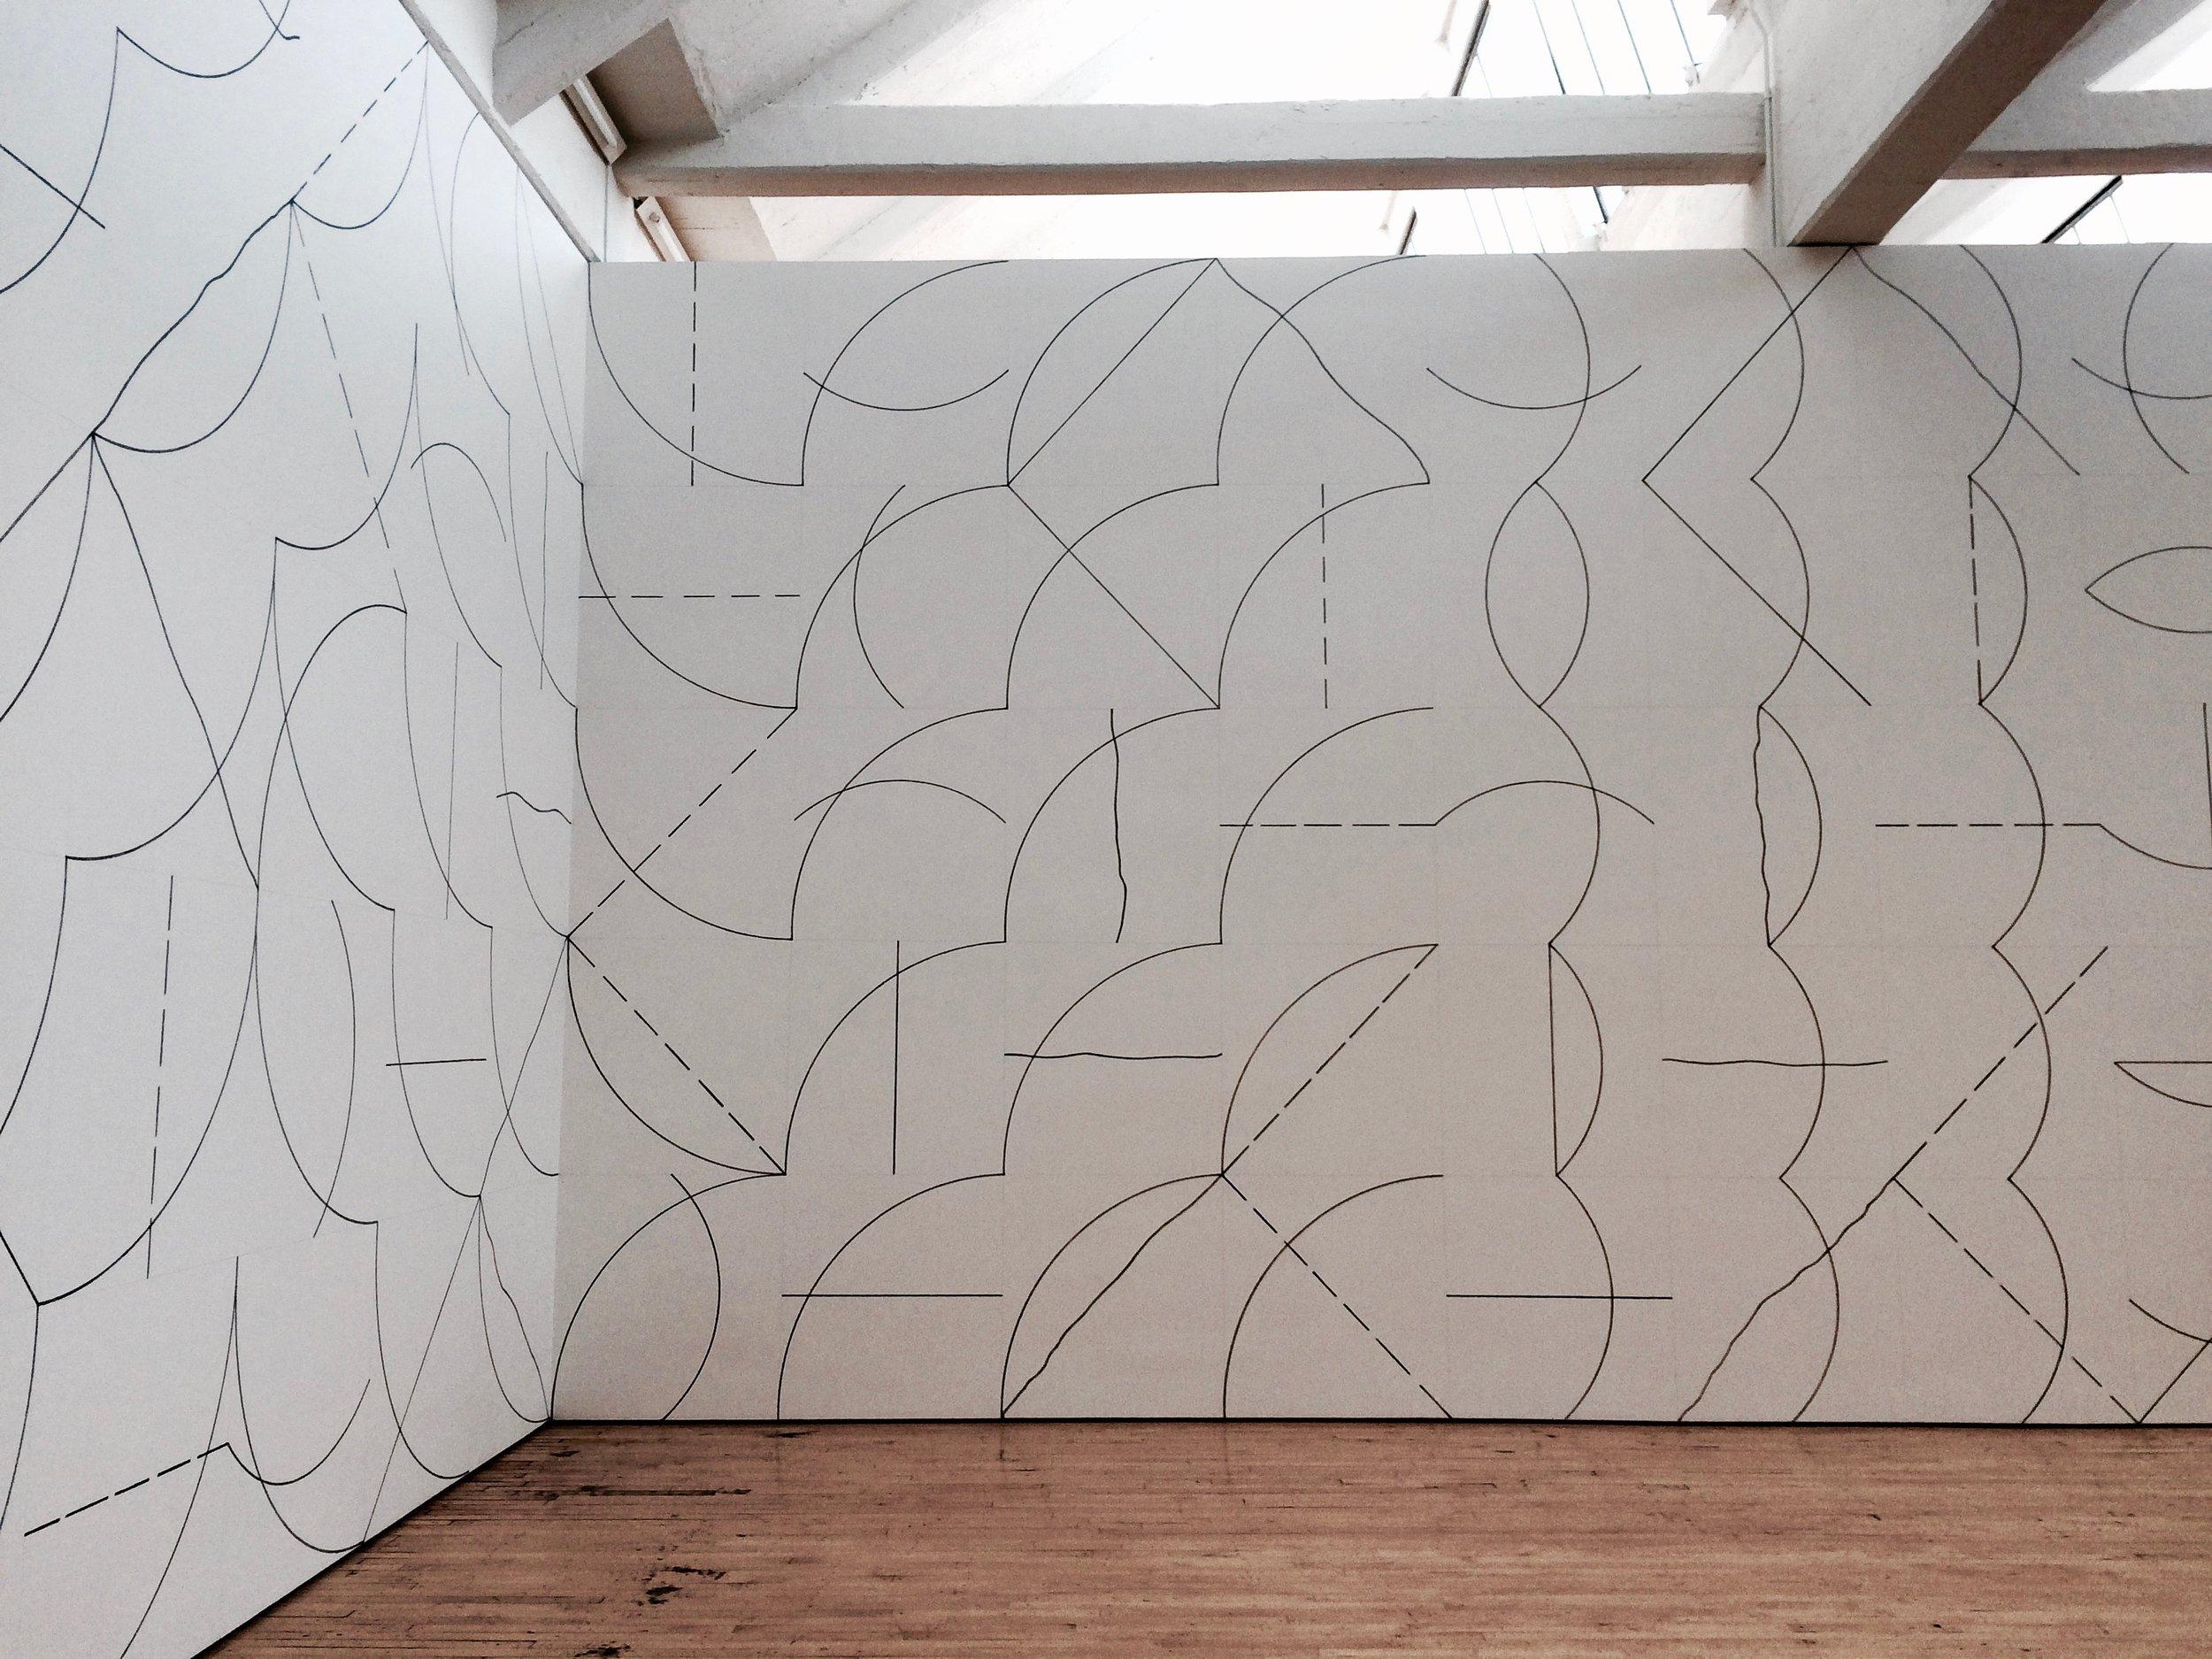 Sol Lewitt,  Wall Drawing #136: Arcs and Lines , 1972, Dia Beacon